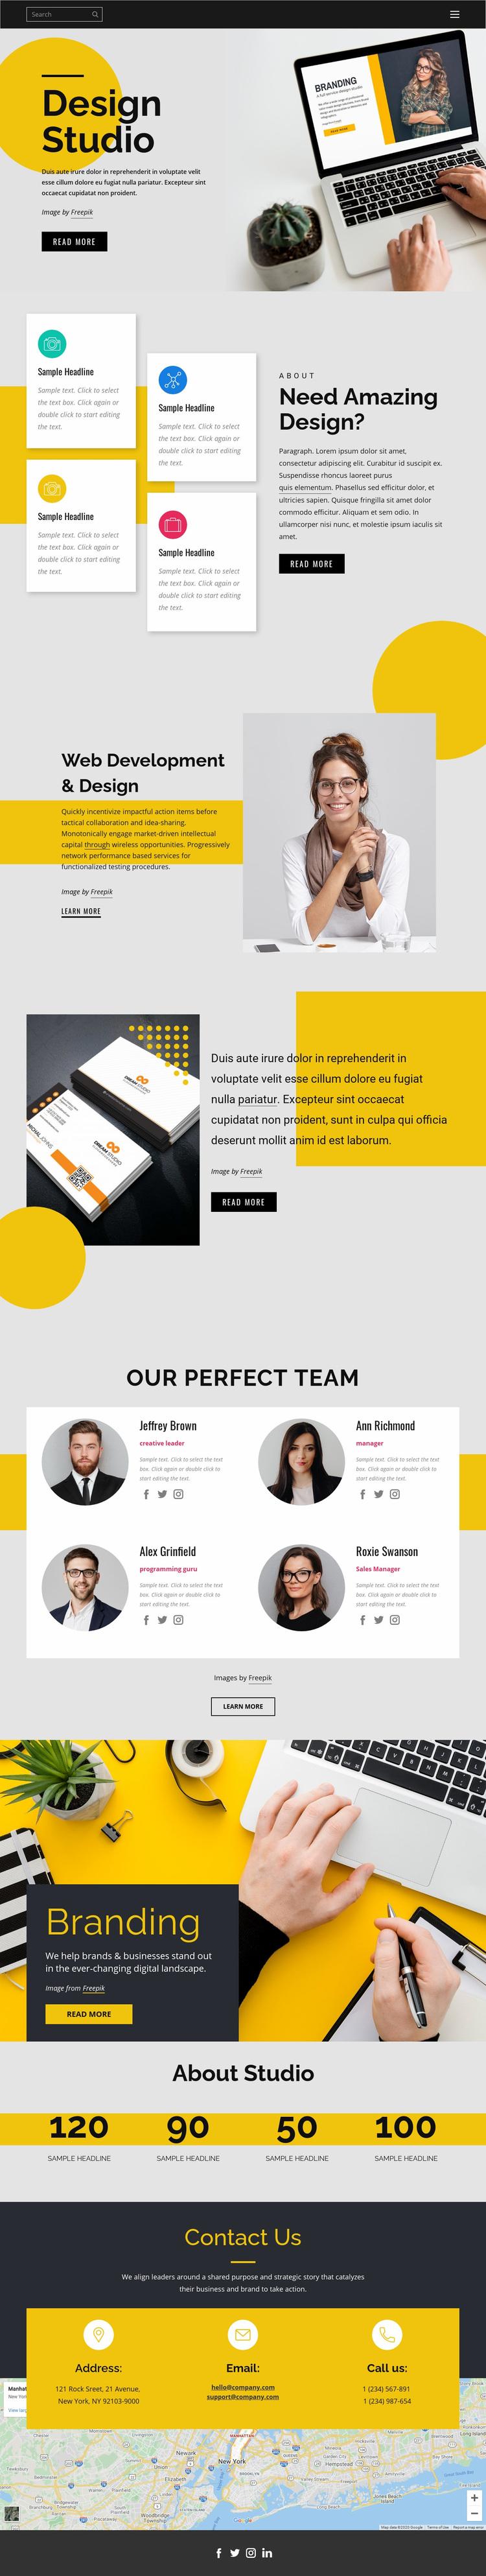 Brand, print & web design Web Page Designer